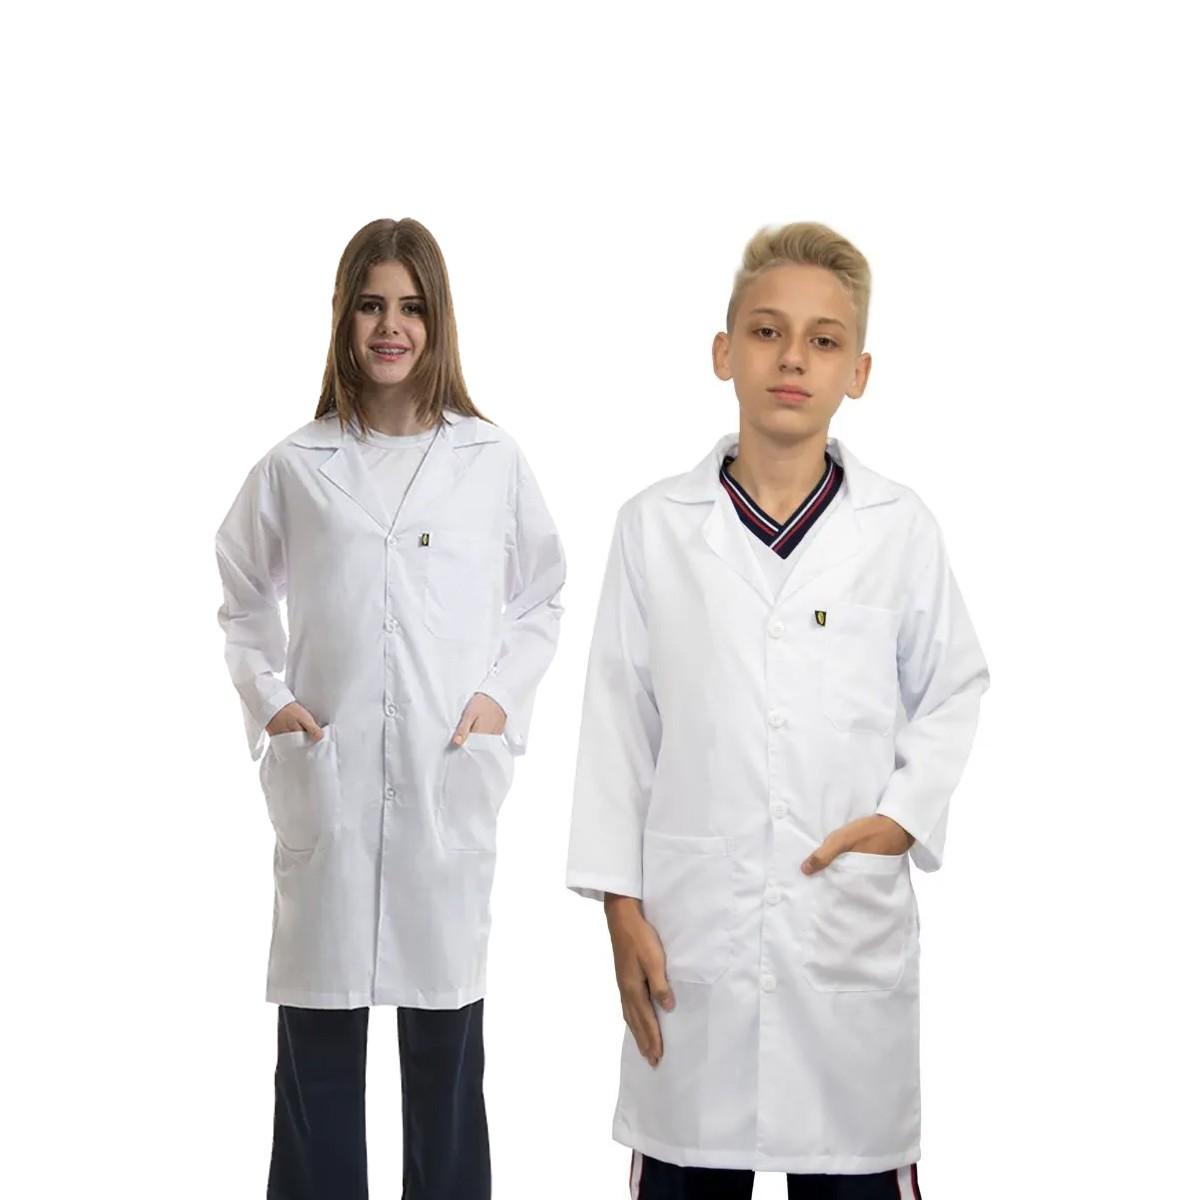 Jaleco infantil estudante laboratório escolar unissex